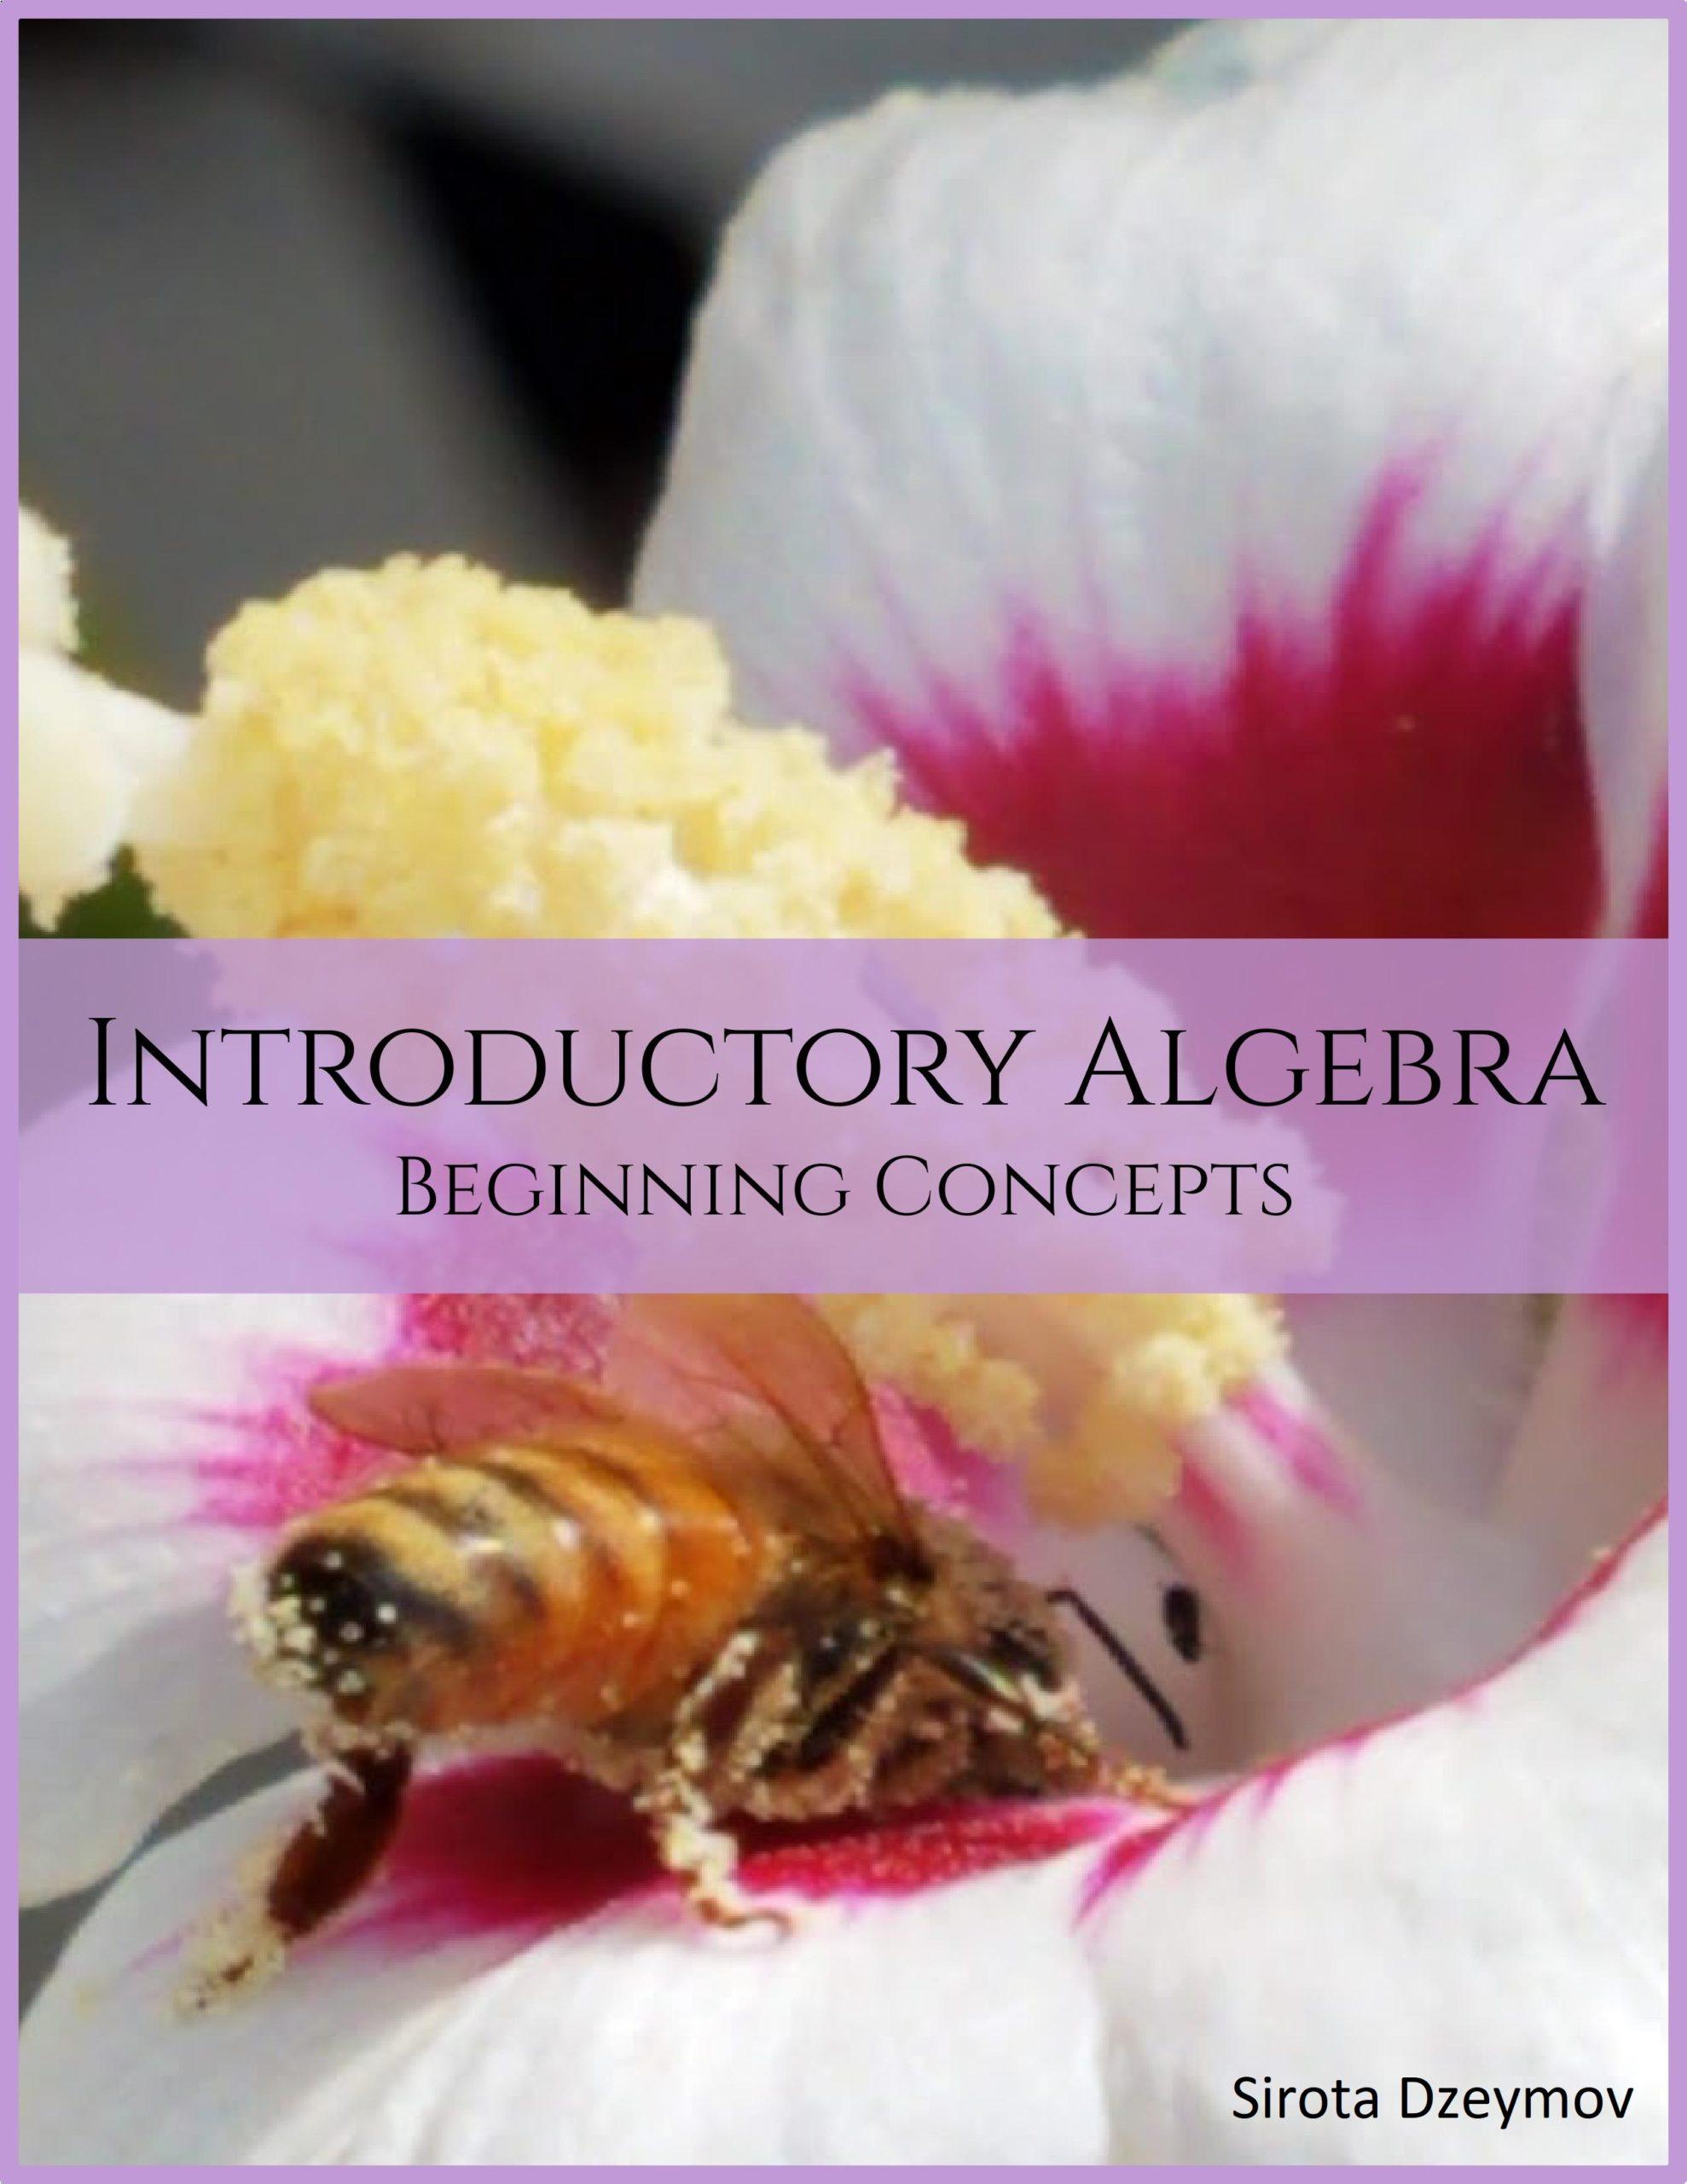 Introductory Algebra